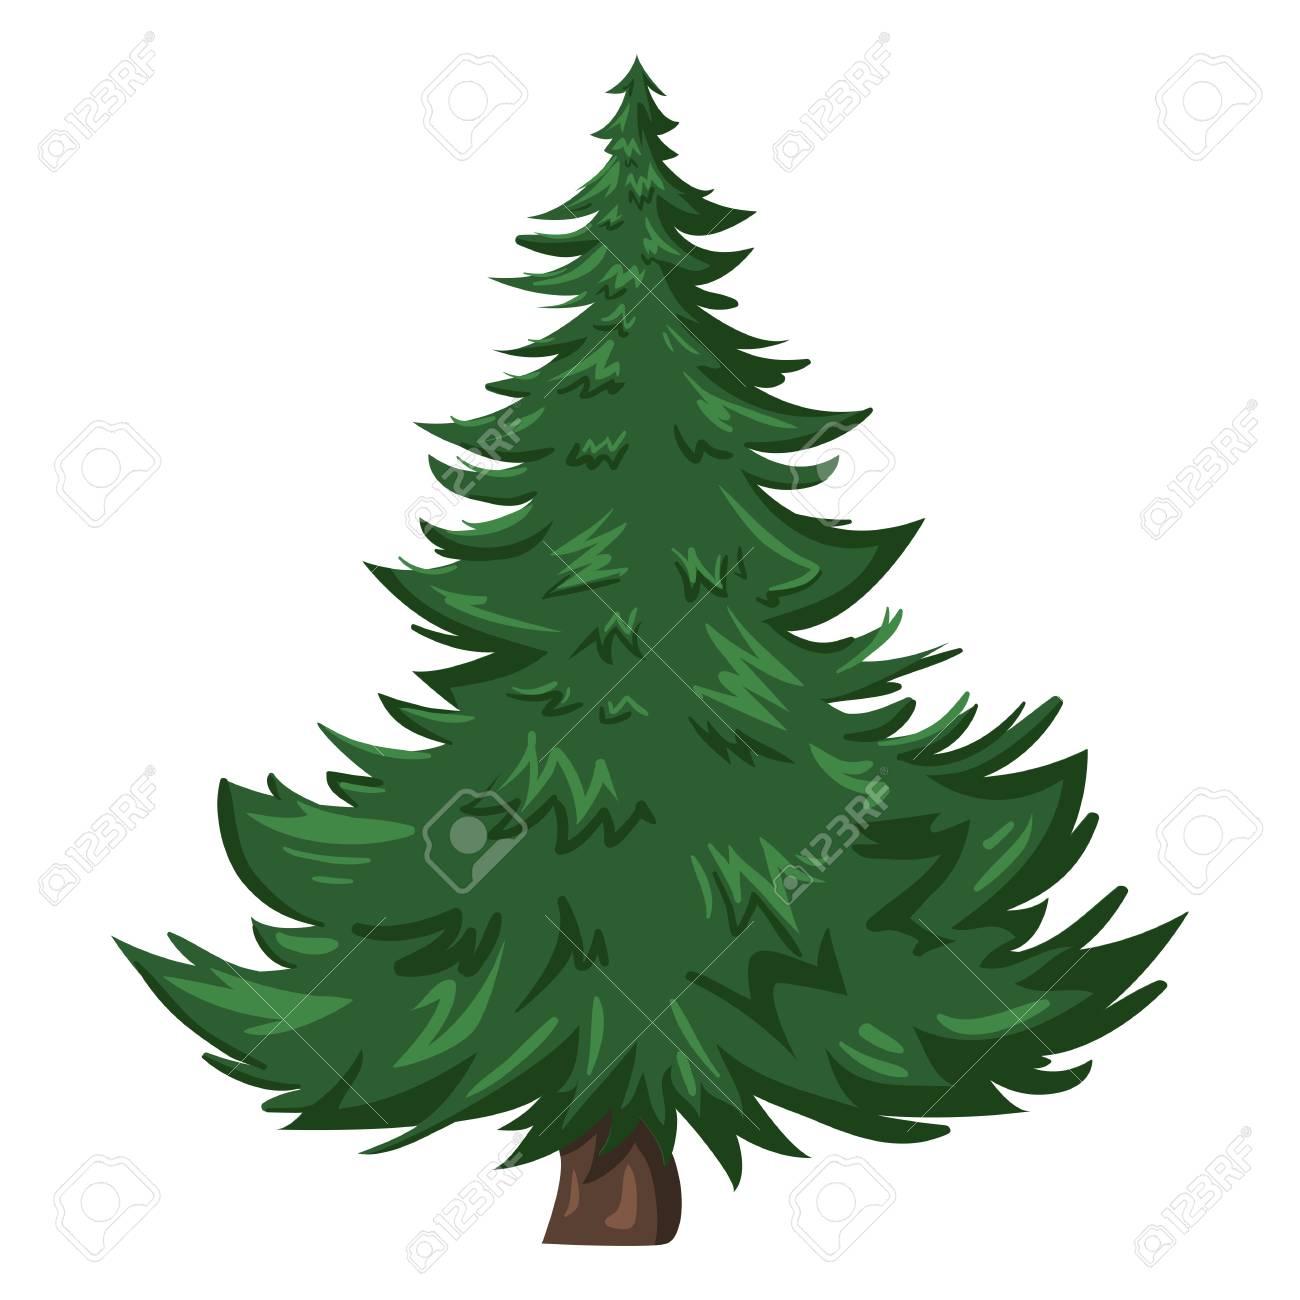 vector single isolated cartoon pine tree on white background royalty rh 123rf com pine tree vector free pine tree vector illustration